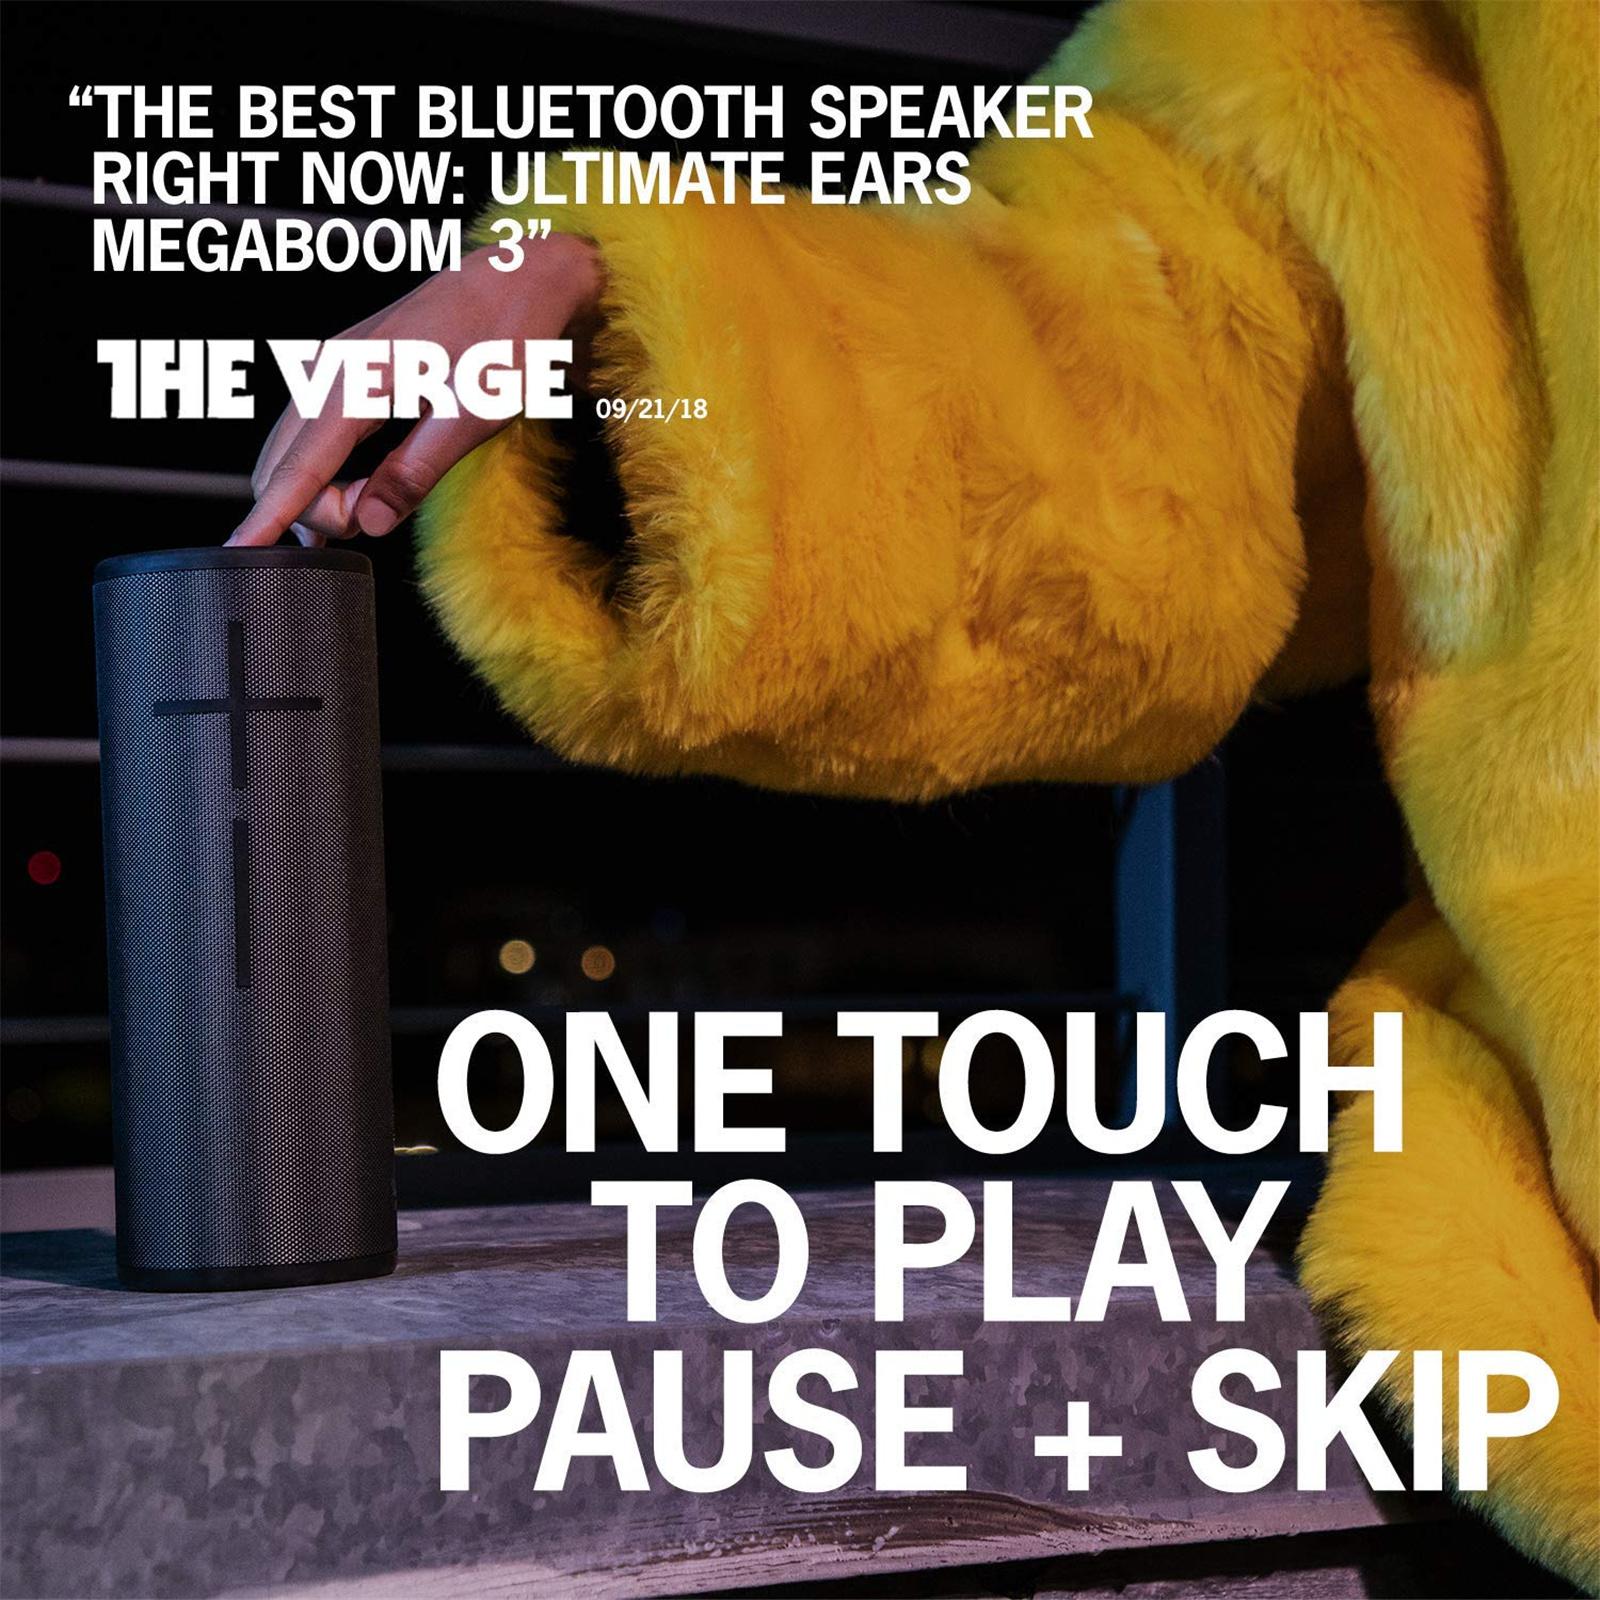 Buy the Ultimate Ears UE MEGABOOM 3 Portable Wireless Bluetooth Speaker  -    ( 984-001414 ) online